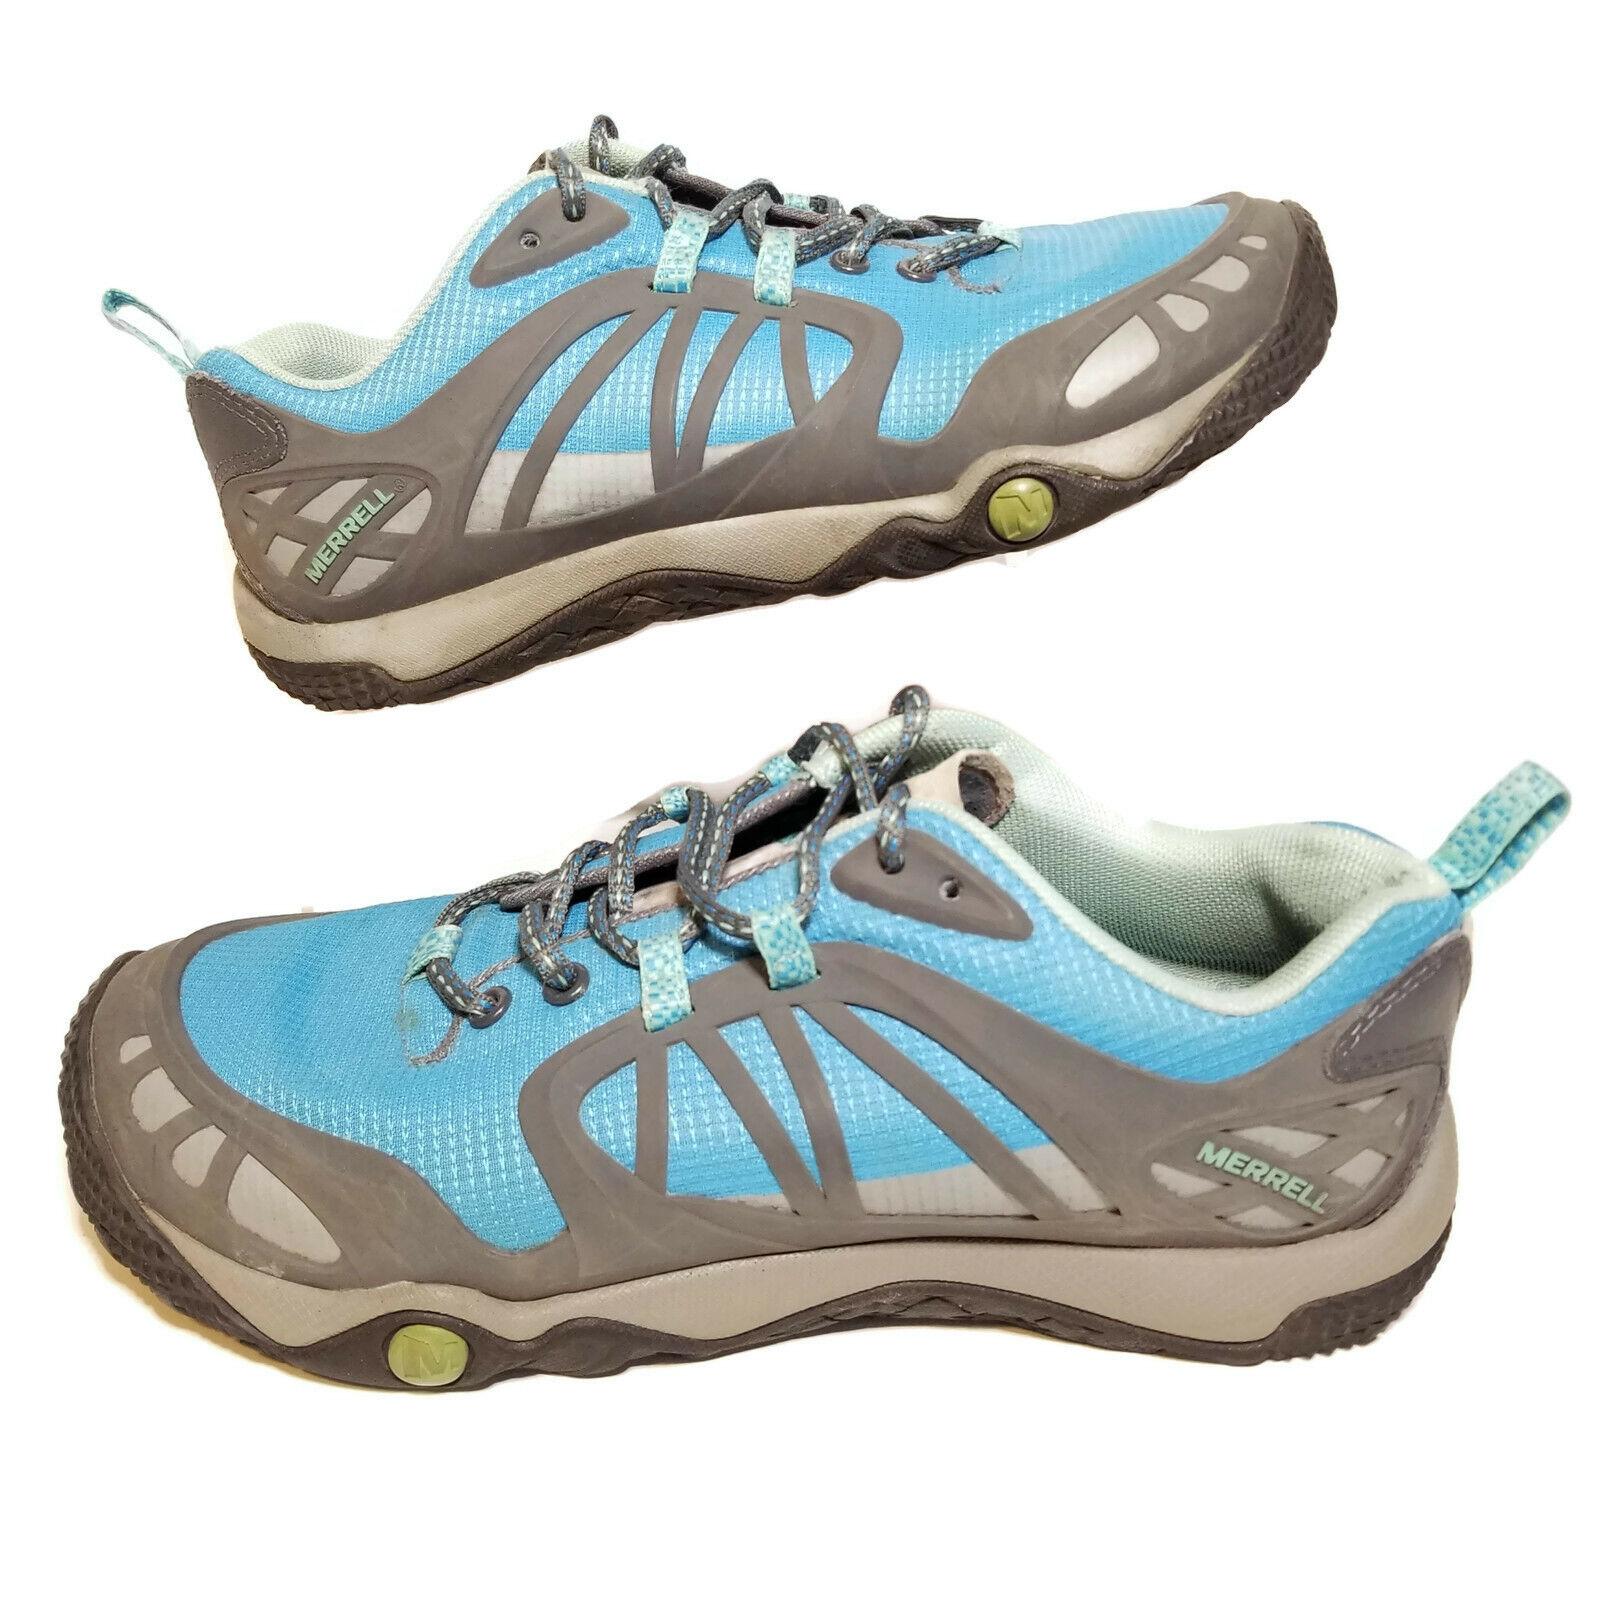 Merrell Womens 8 Sea Shore shoes bluee Grey Hiking Prederra Vim Sport J57258 0027d0d5c88